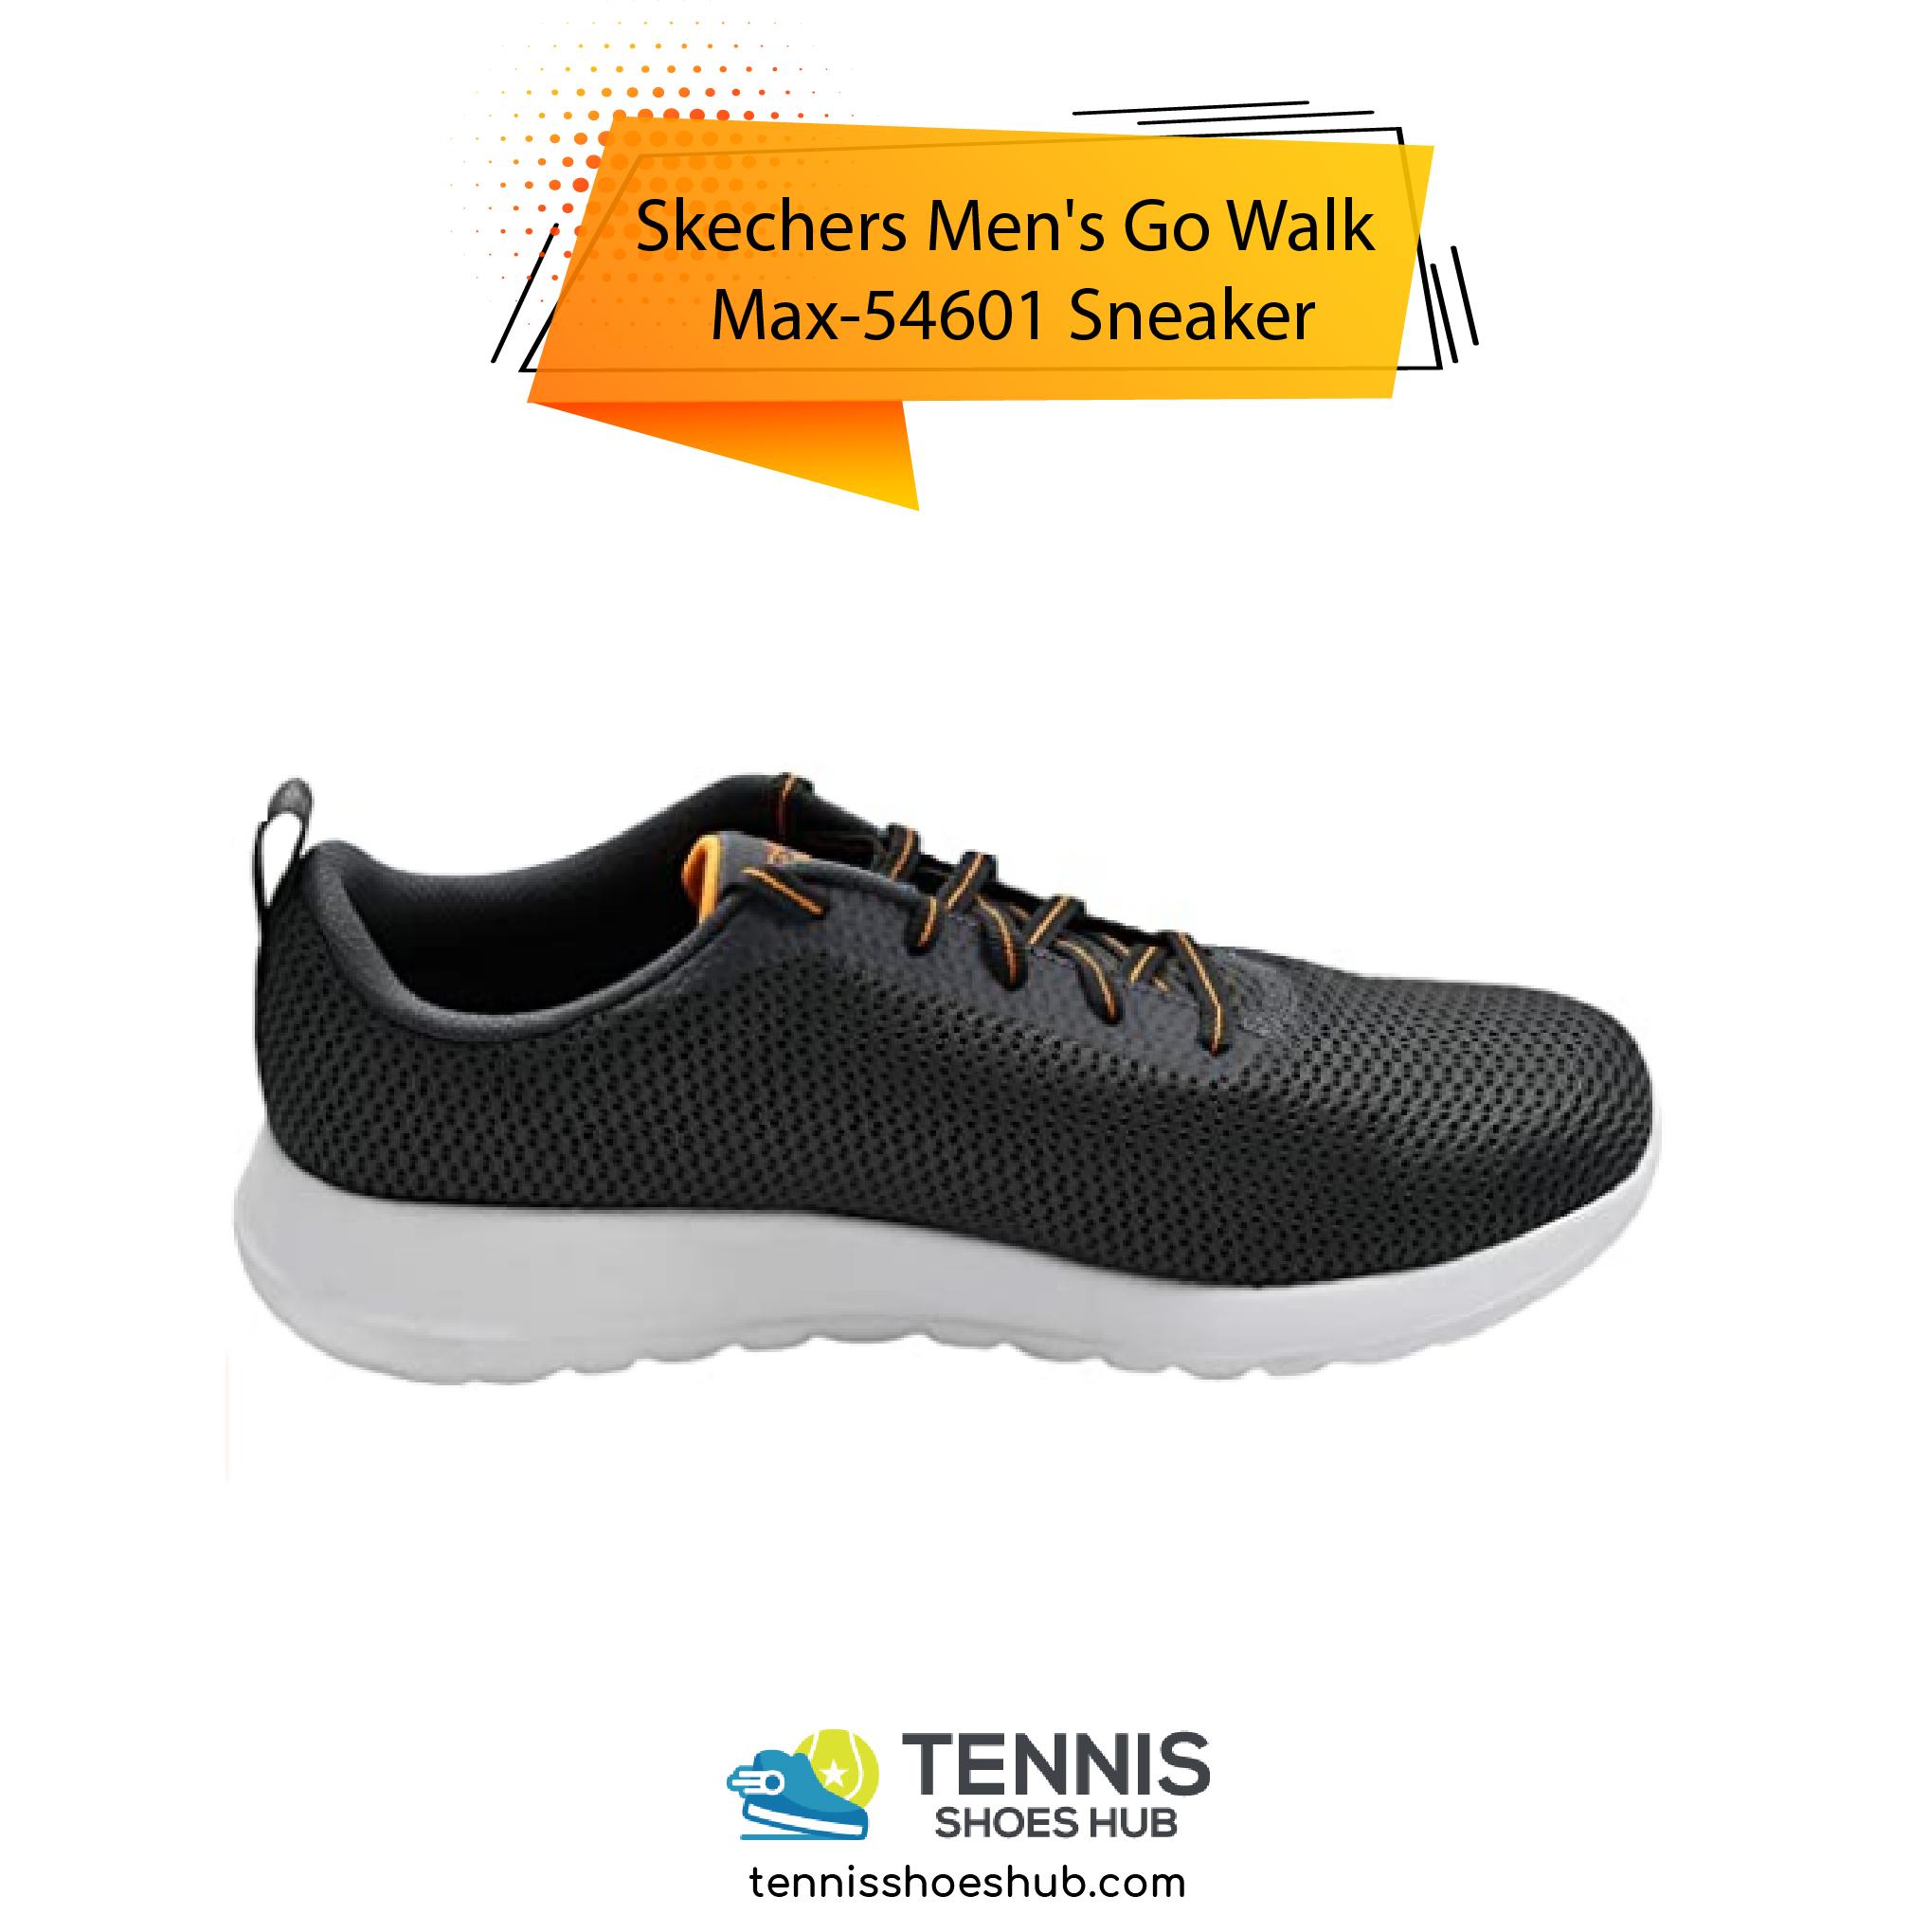 Skechers Mens Go Walk Max 54601 Sneaker 01